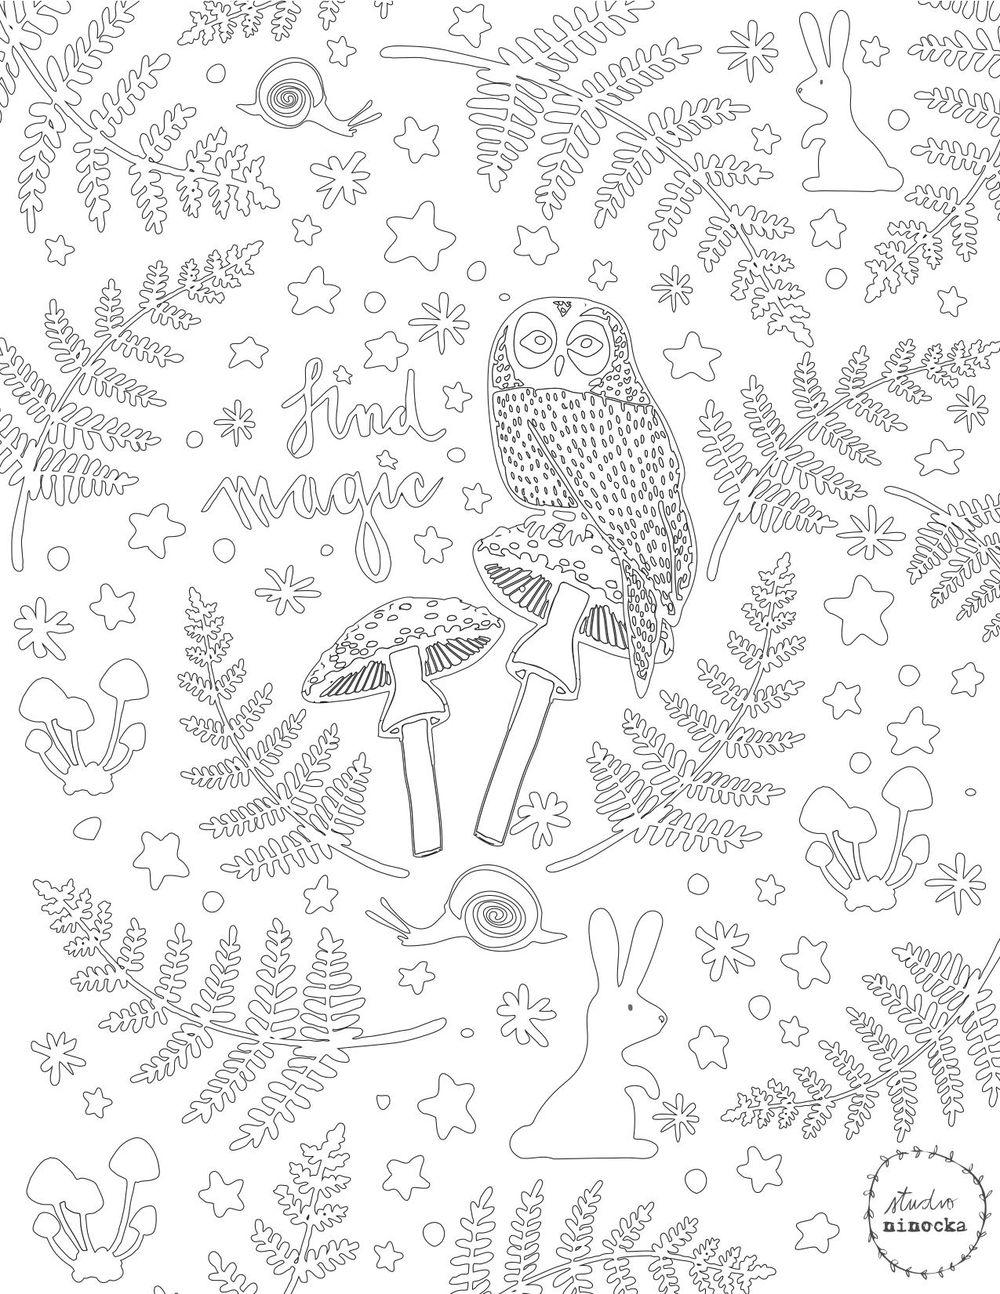 Studio Ninocka - Coloring Page - image 1 - student project